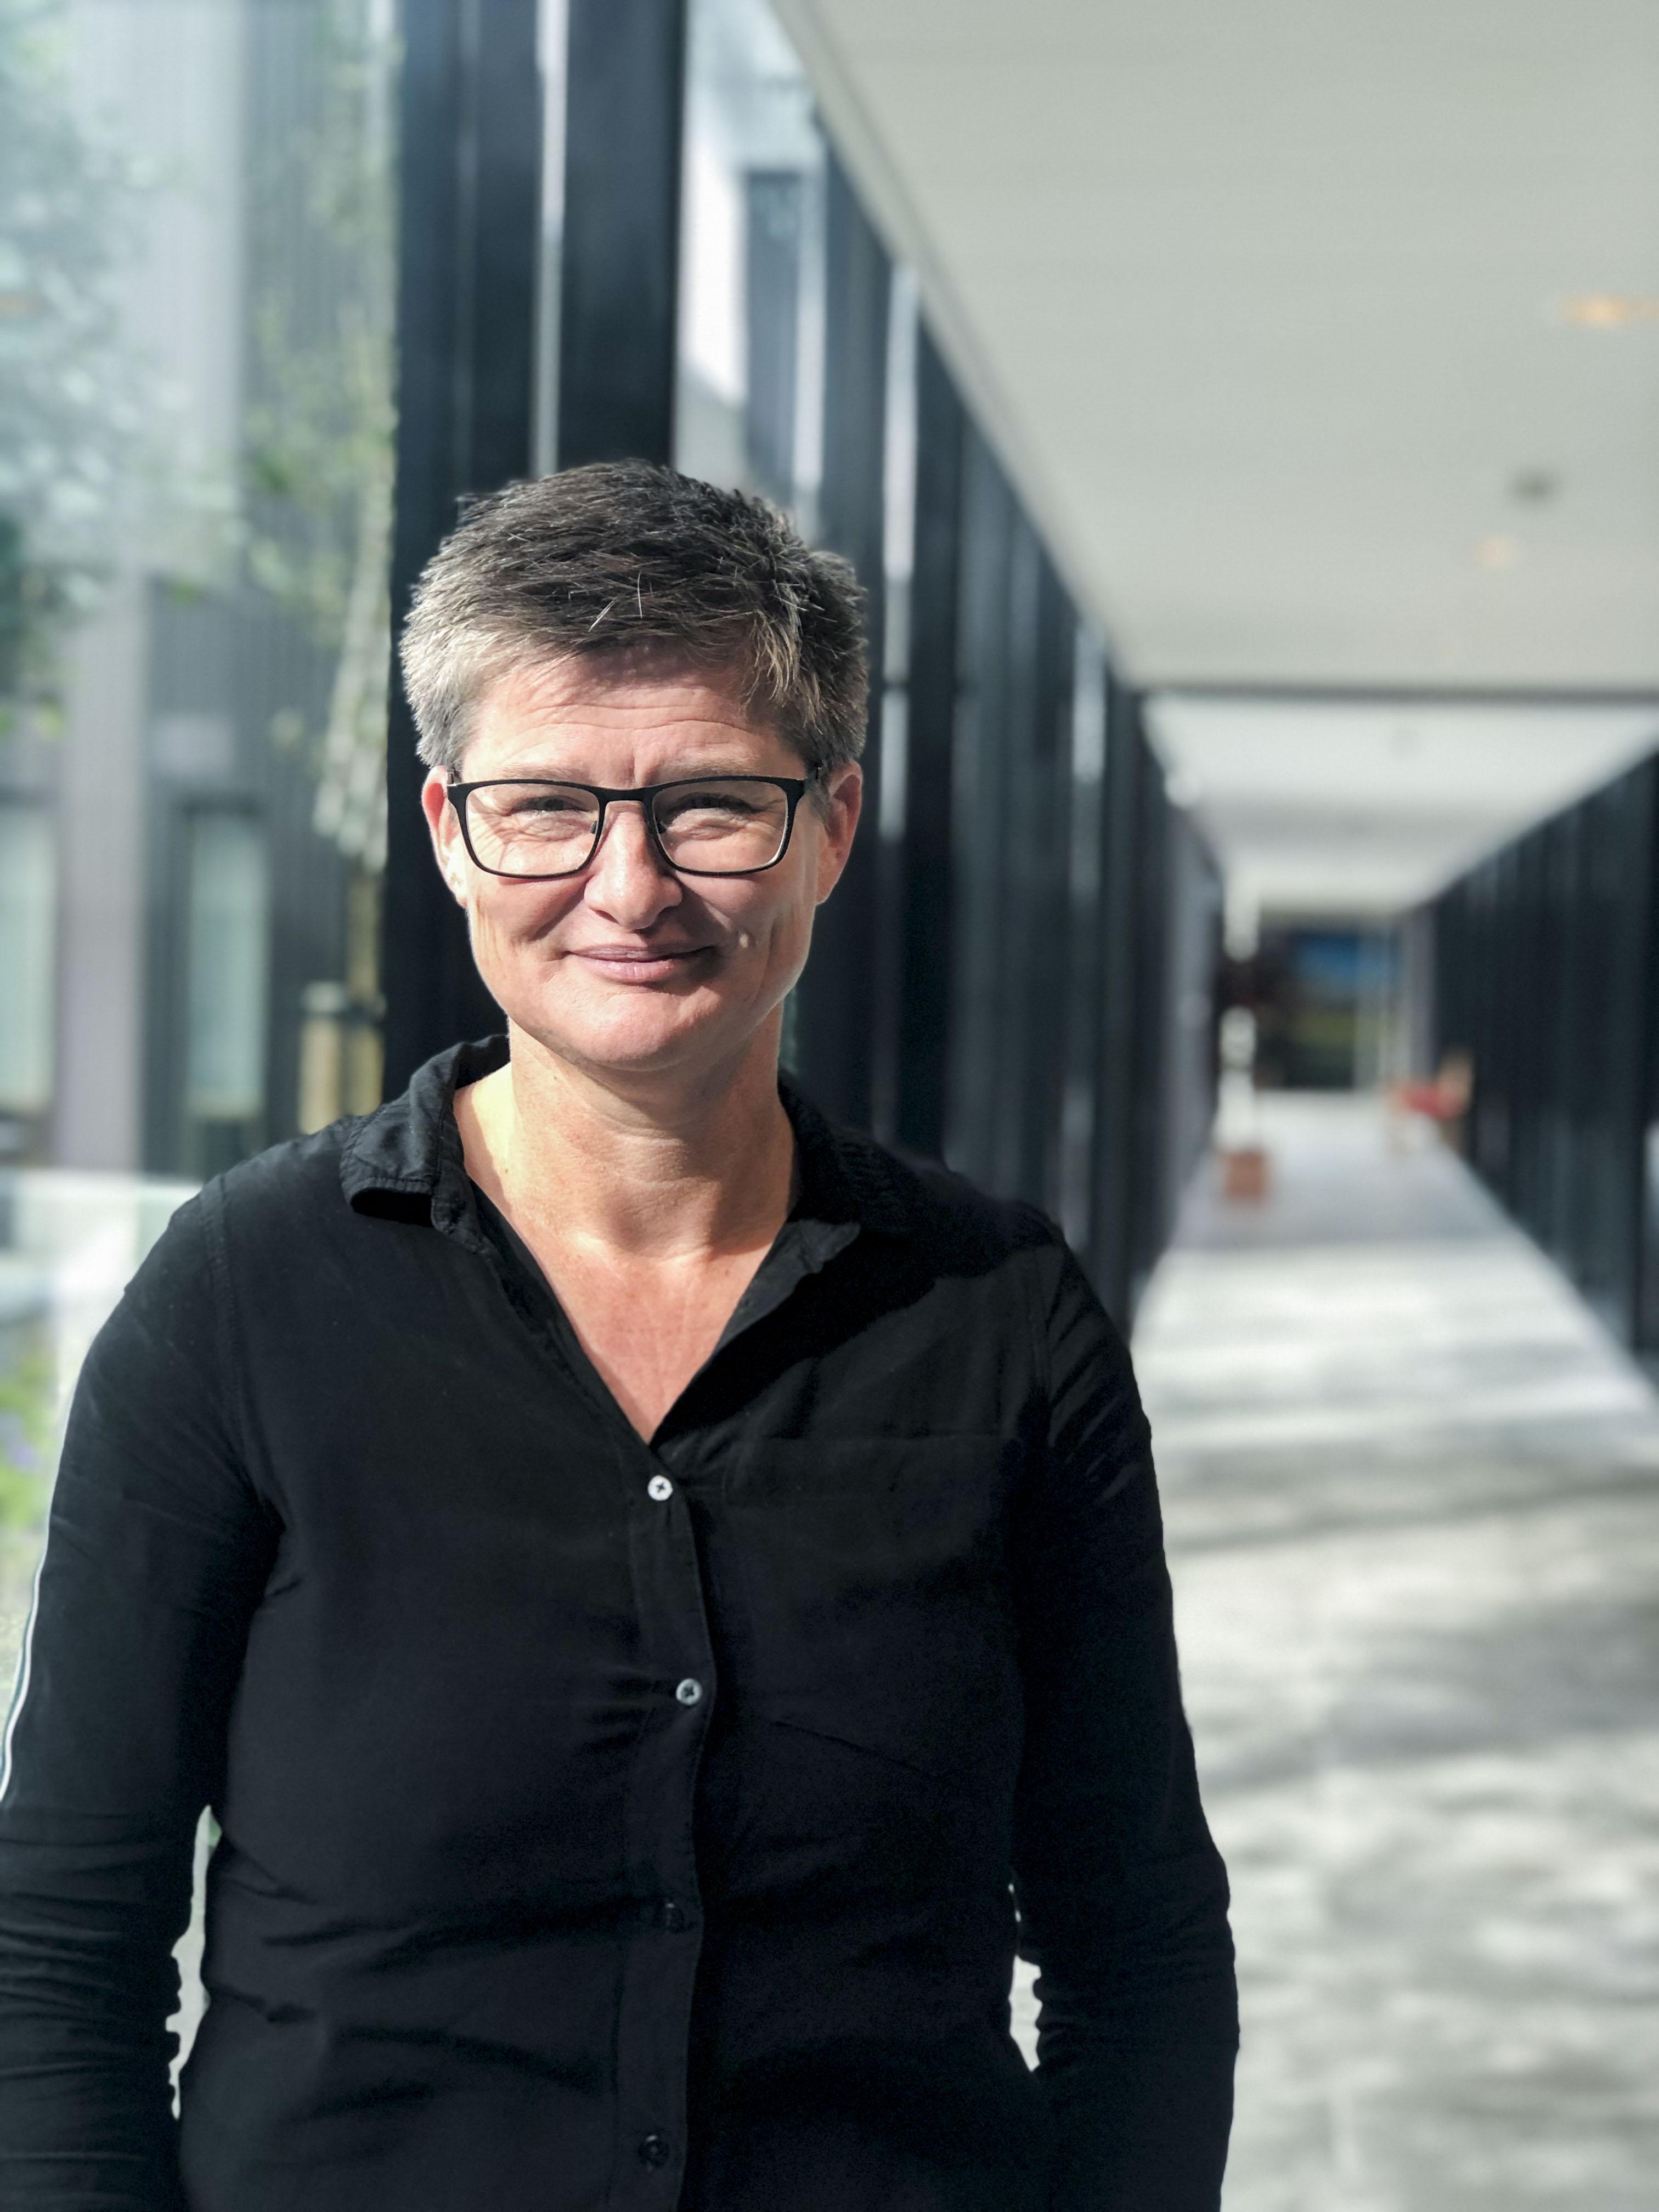 Erica Bloembergen